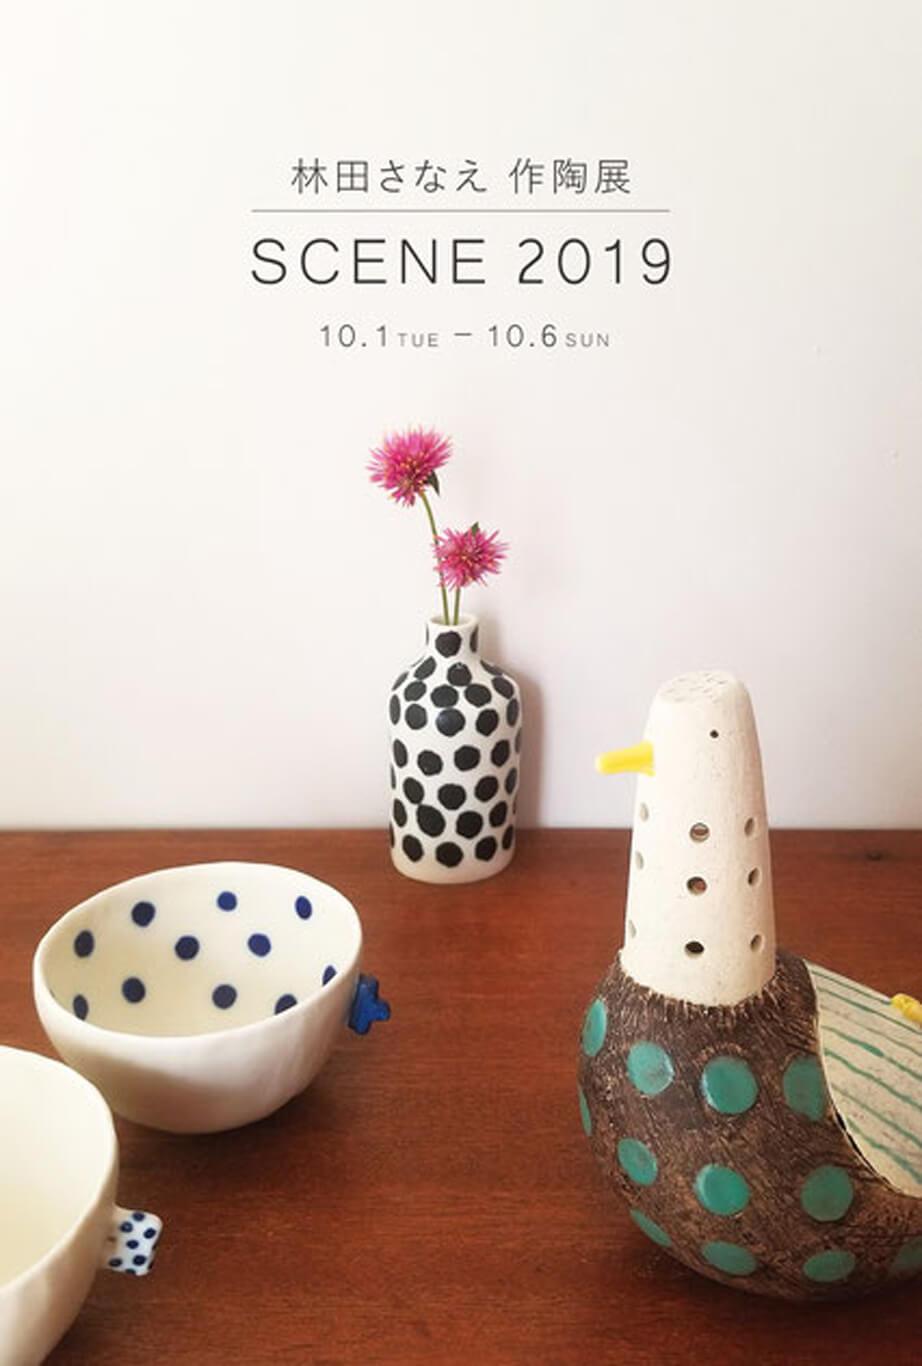 enlc-201910-林田さなえ-展覧会